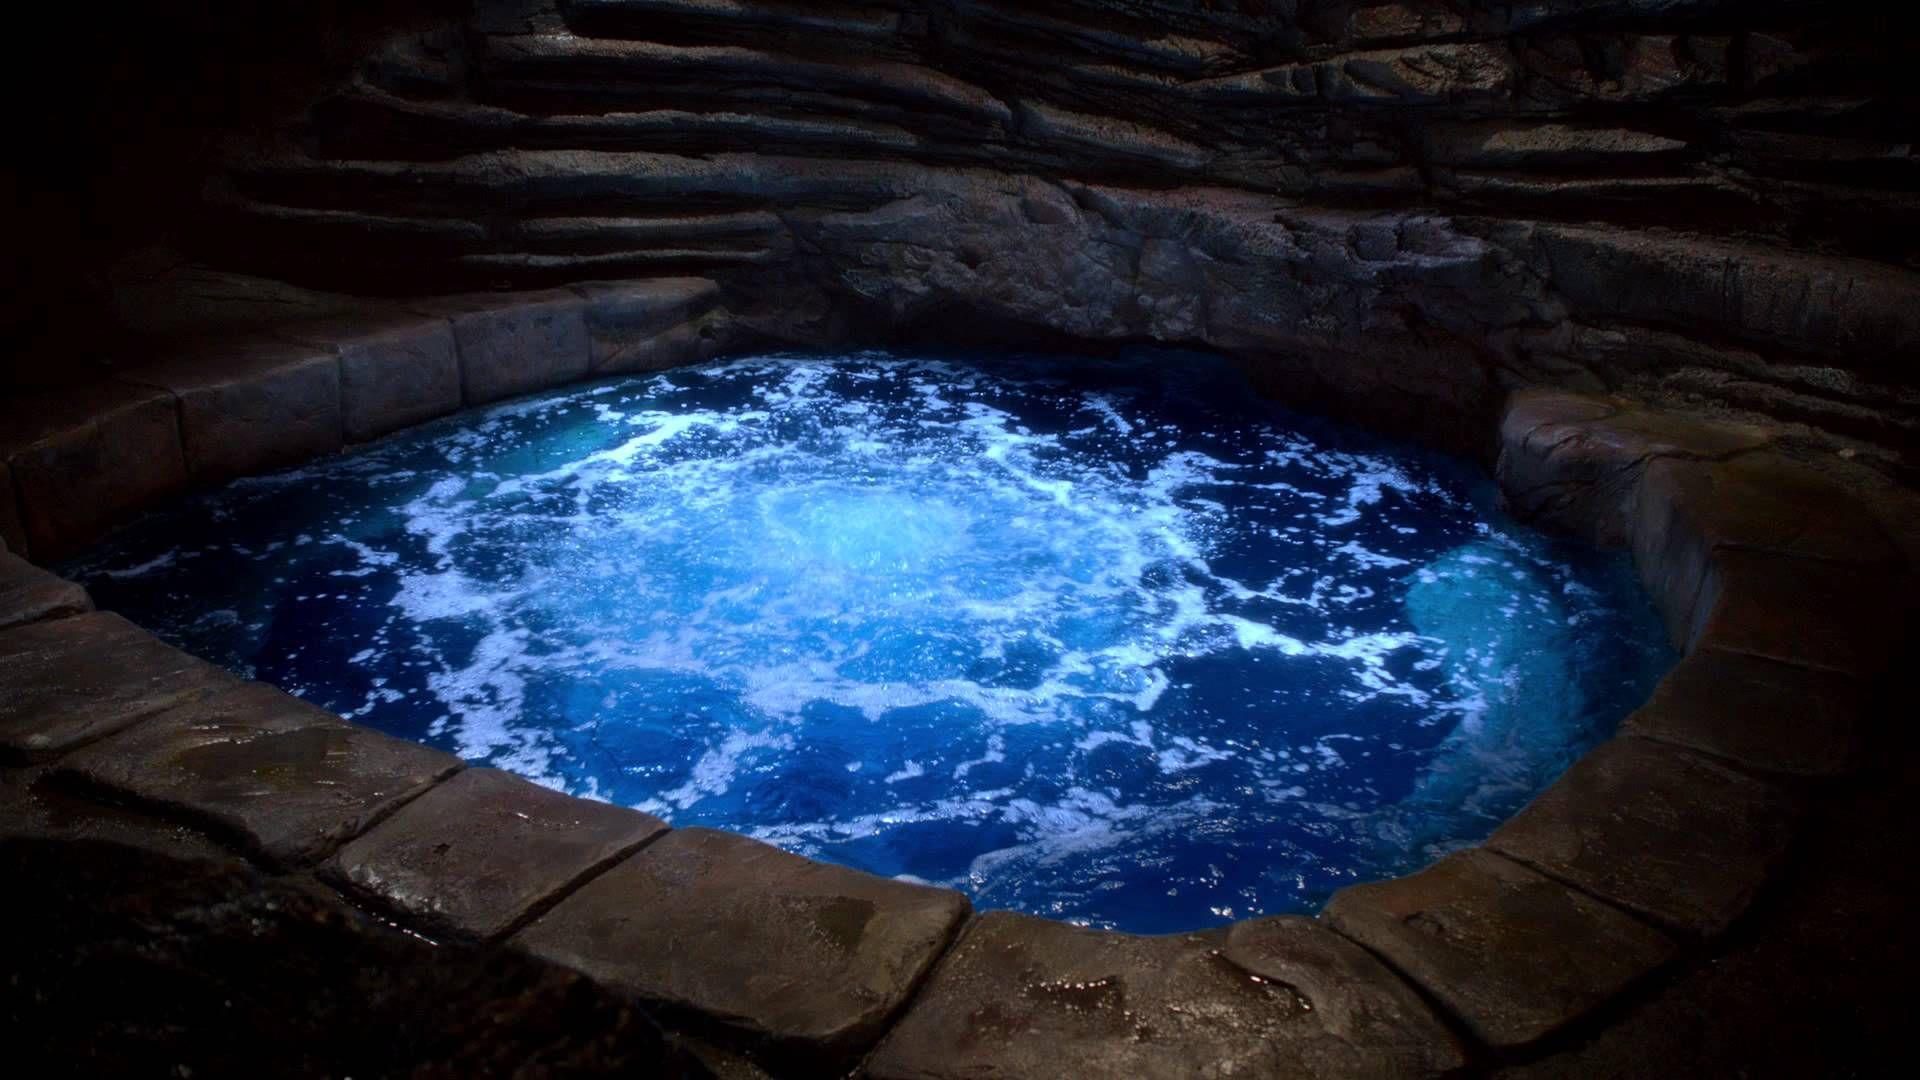 The Moon Pool Moon Pool H2o Mermaids